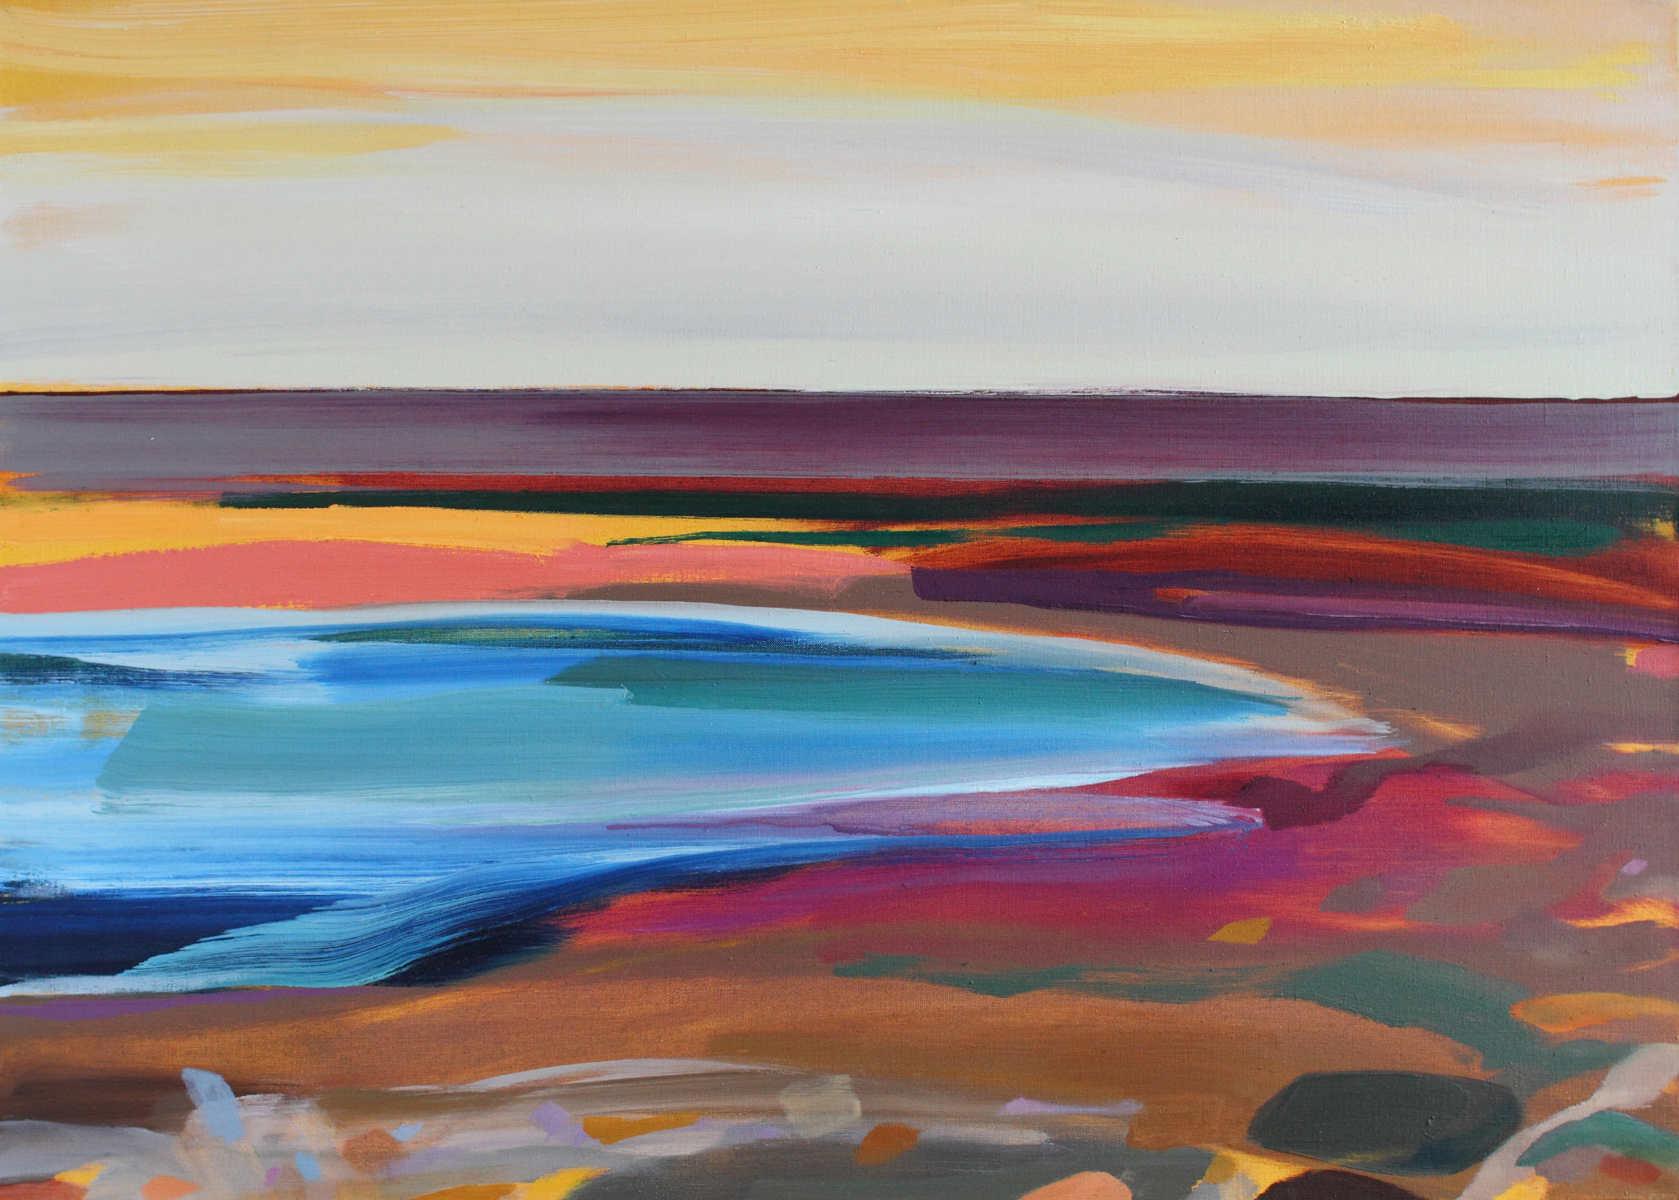 Seascape titled Blakeney by Shona Barr